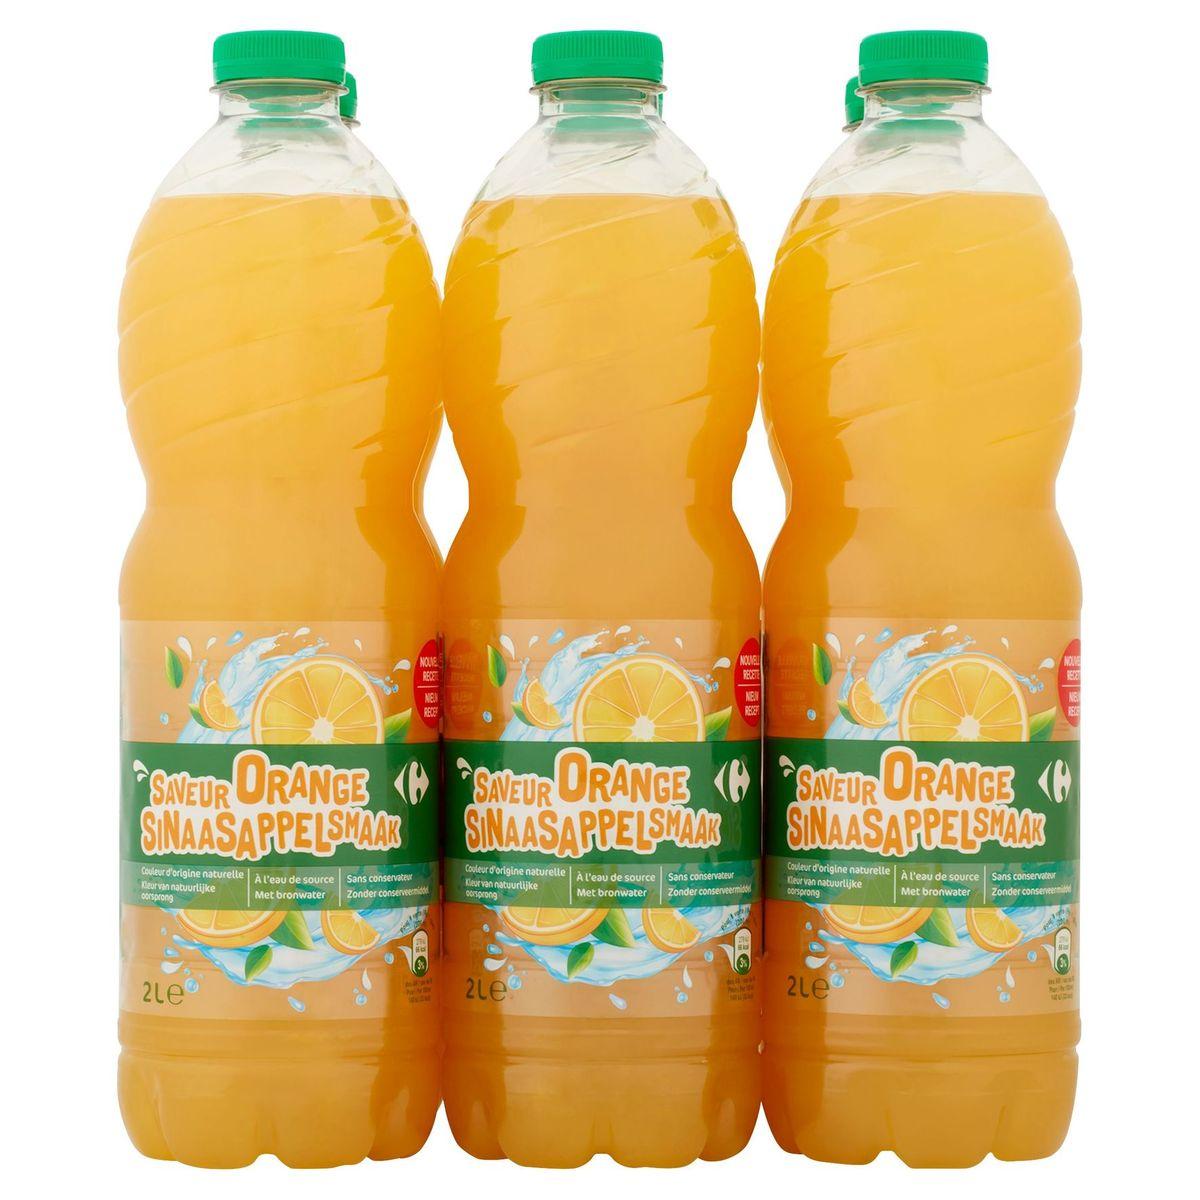 Carrefour Sinaasappelsmaak 6 x 2 L